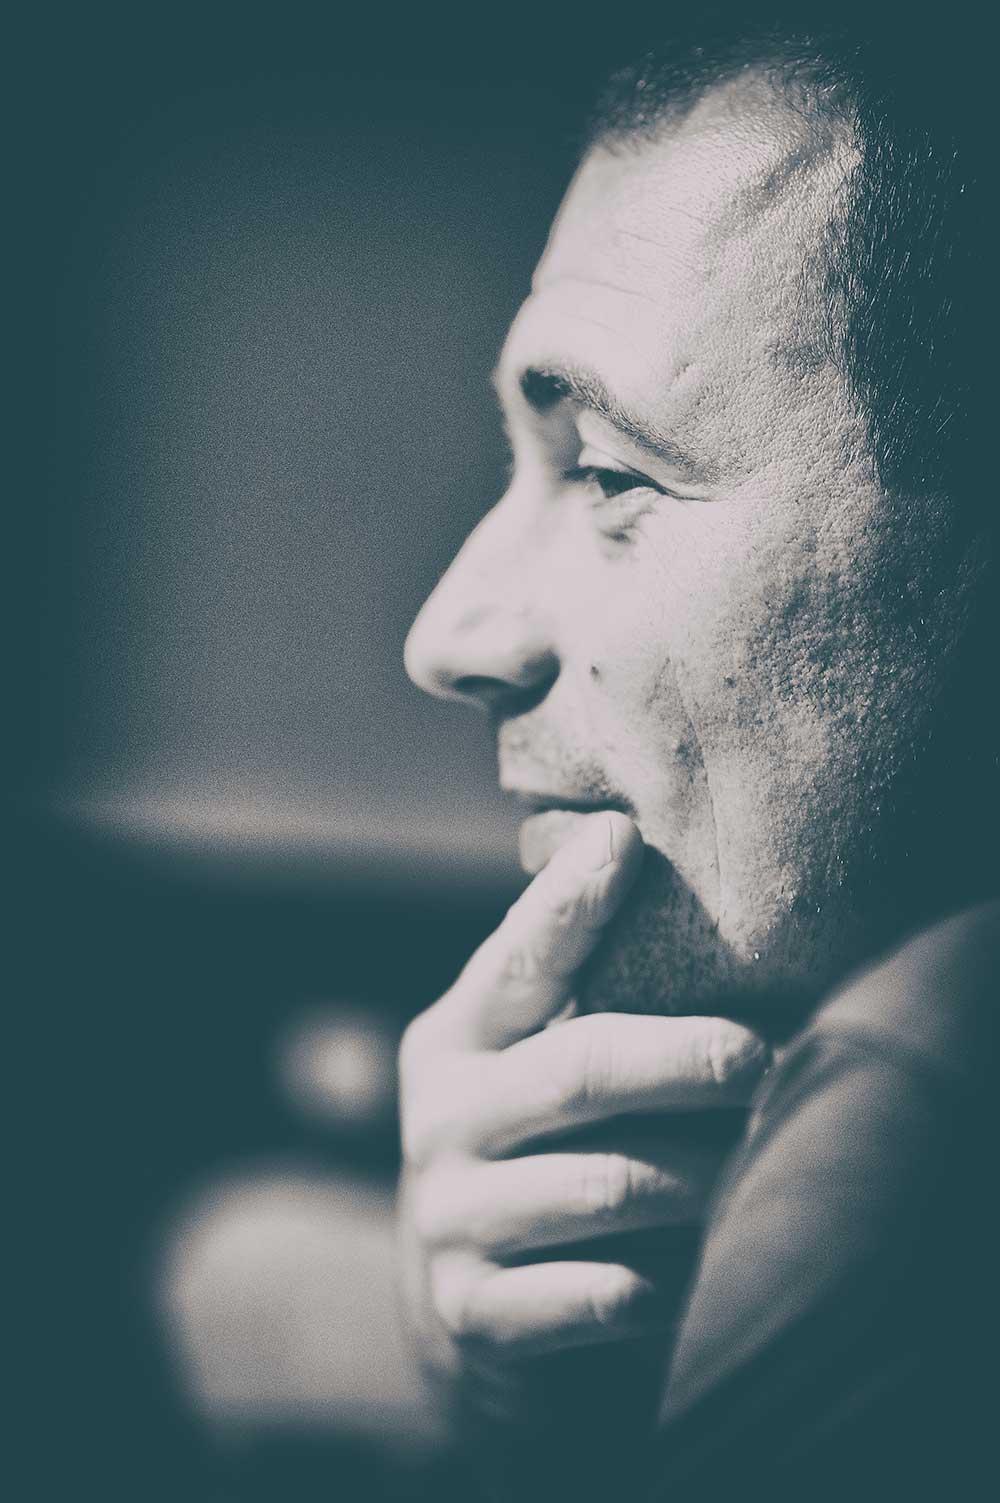 Tomáš Roubal